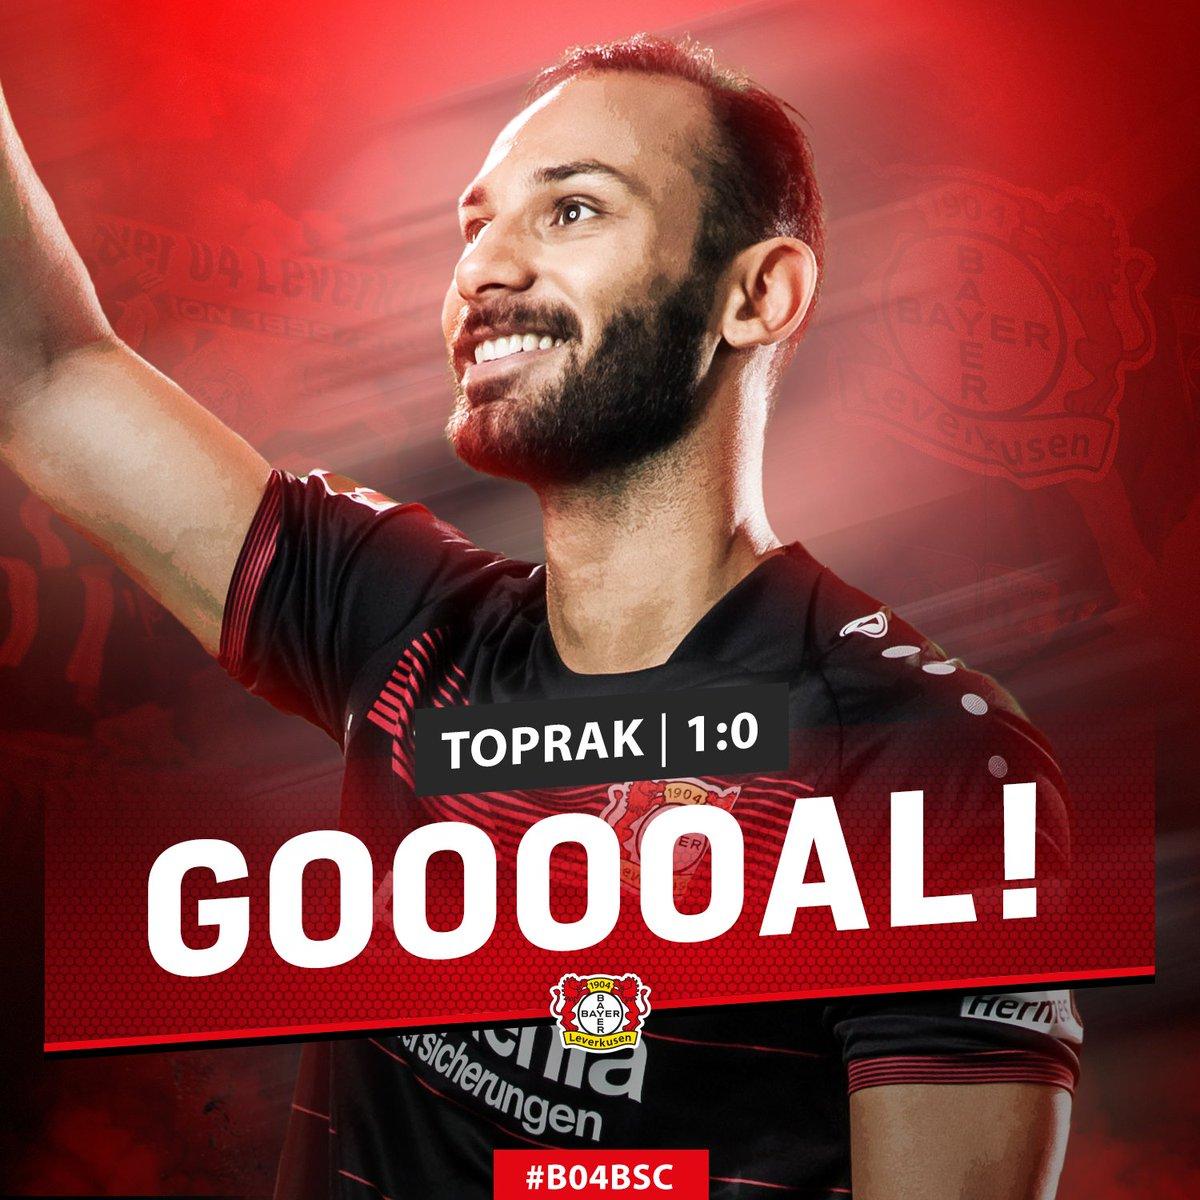 12' GOOOOOOOOOAAAAAAL!   Ömer #Toprak makes it 1:0!  #B04BSC https://t...